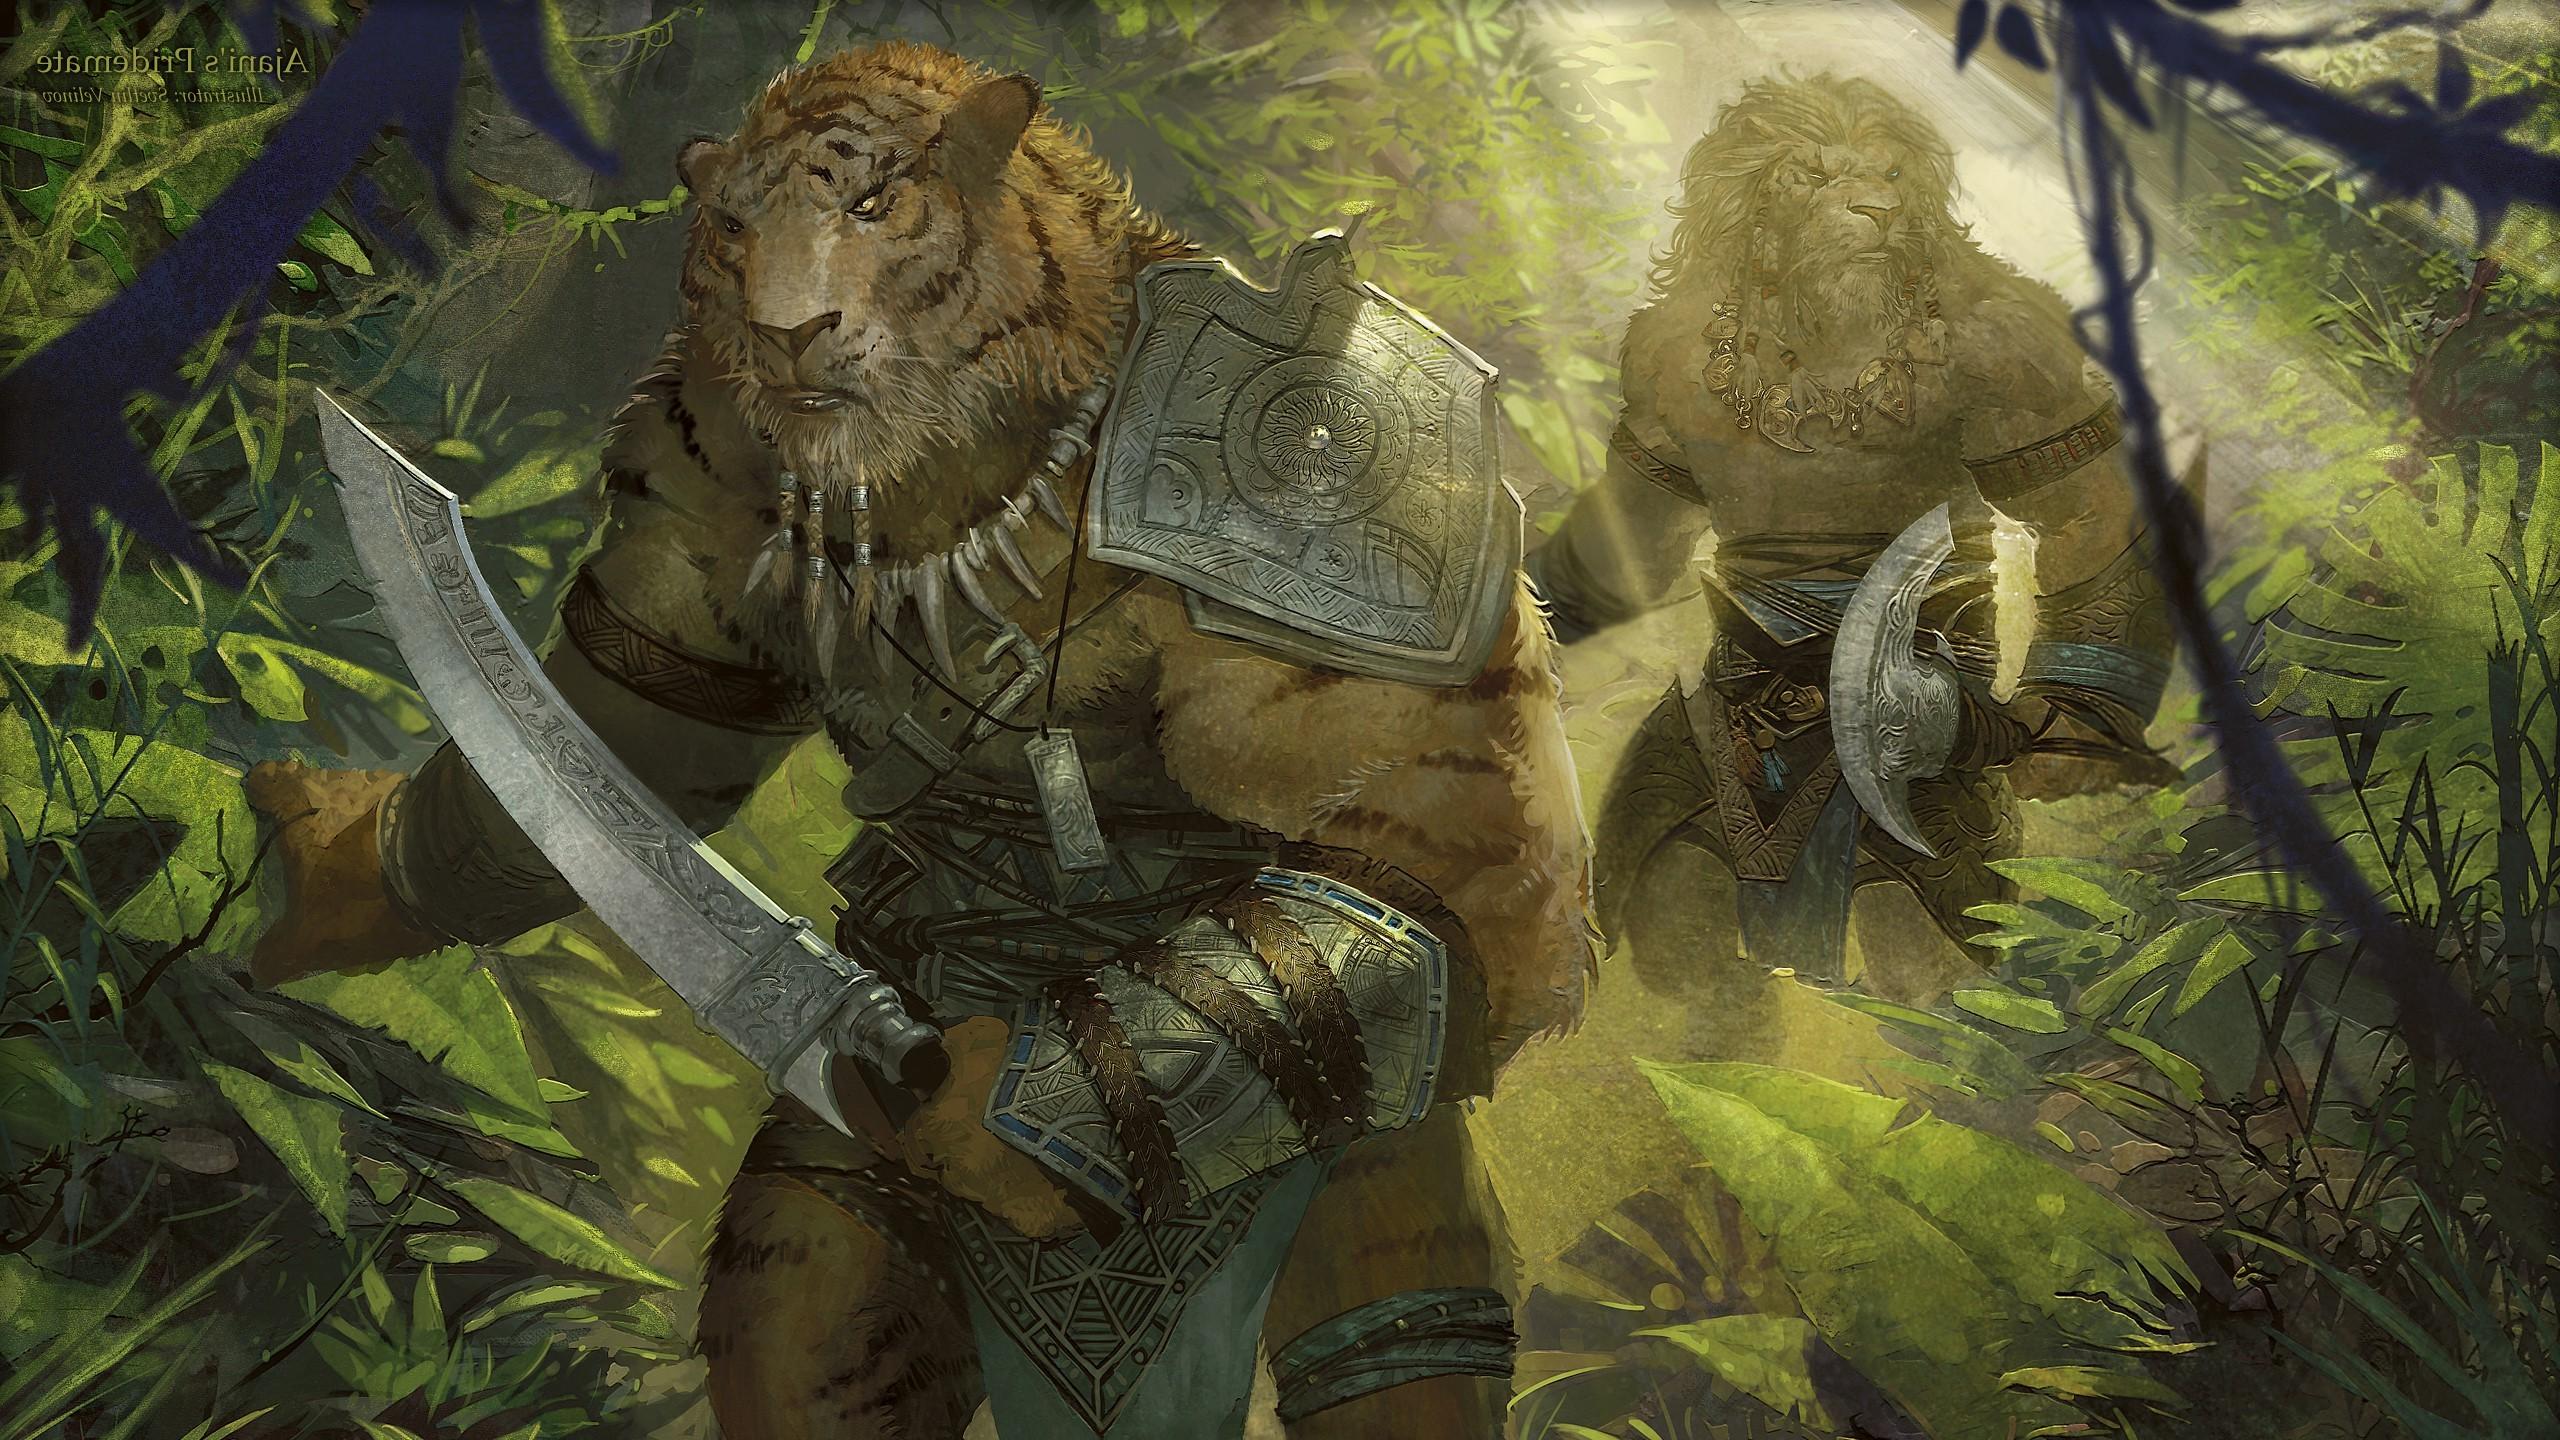 Monster Hunter Girl Wallpaper 1440 Wallpaper Forest Fantasy Art Tiger Wildlife Warrior